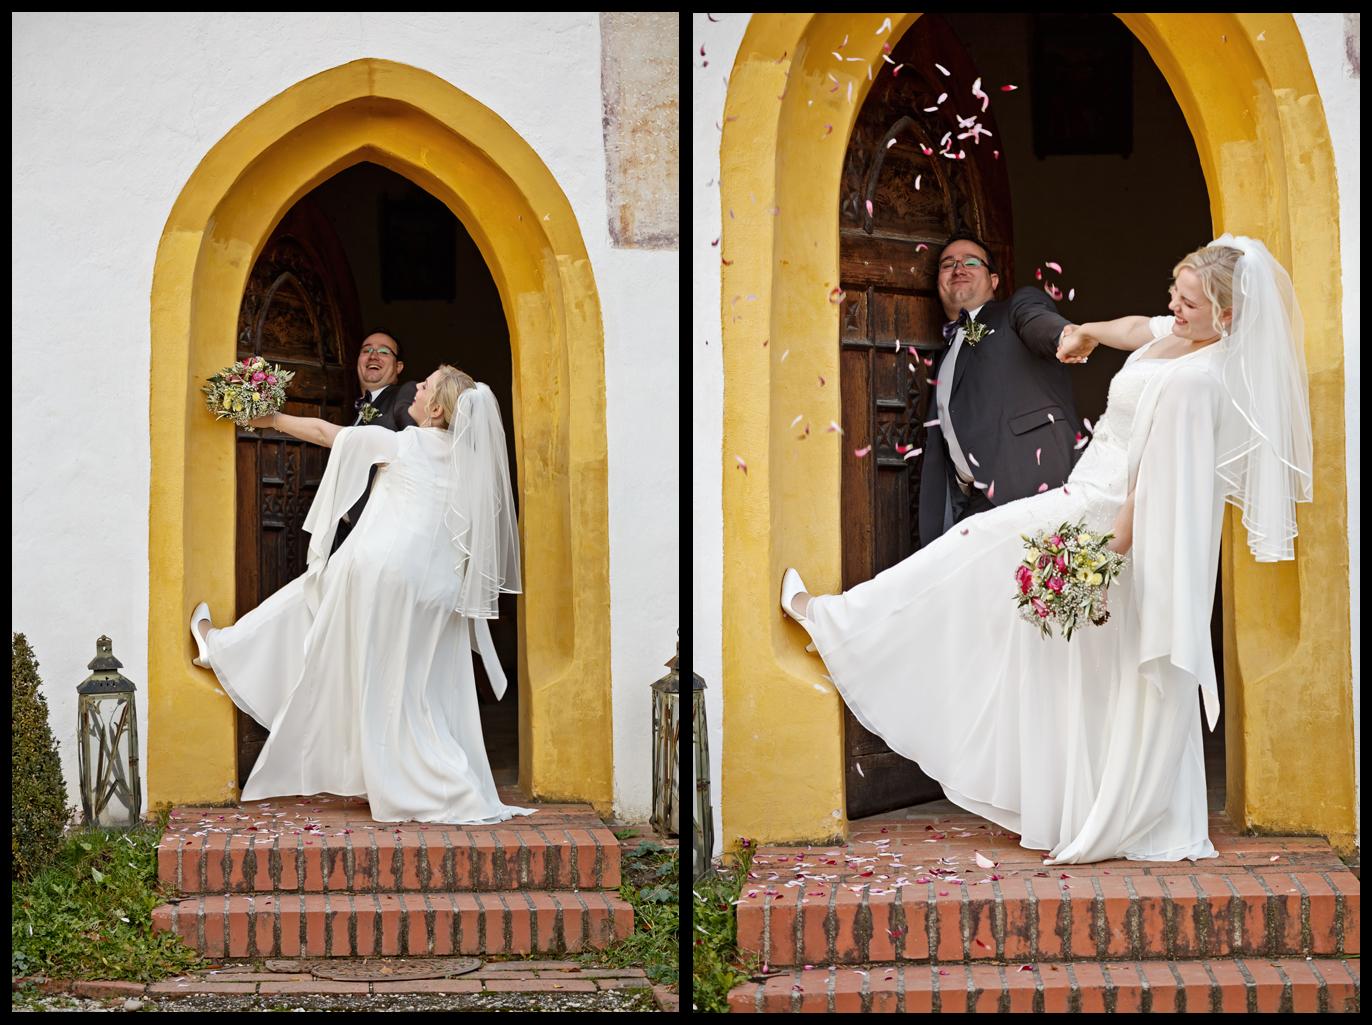 161112-Annika&Stefan-1644-3280-3284 Canon EOS 6D